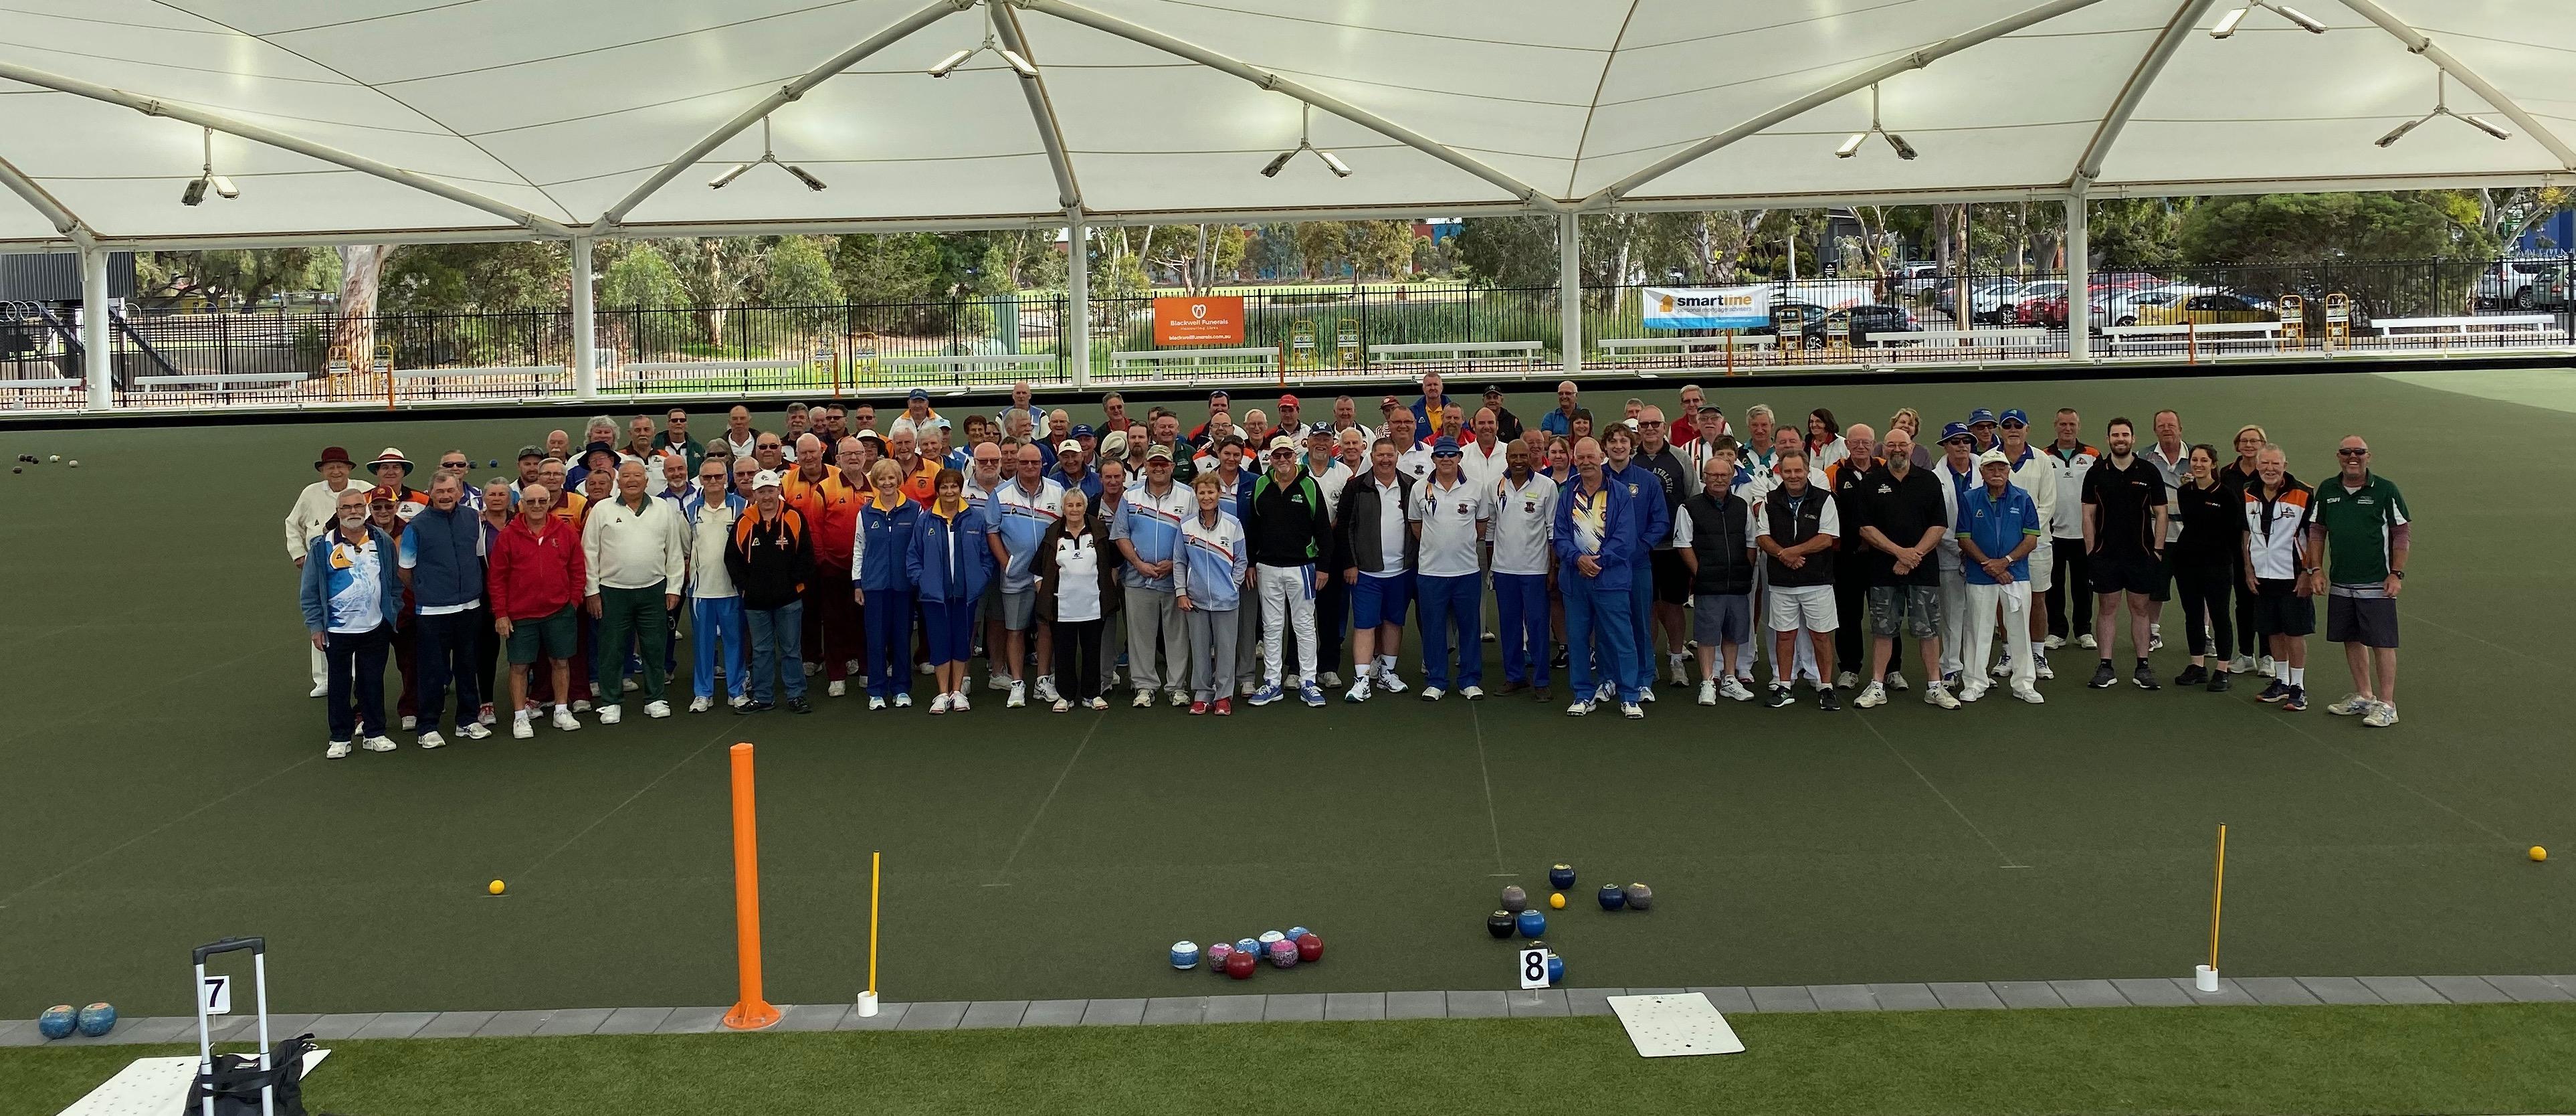 96 competitors